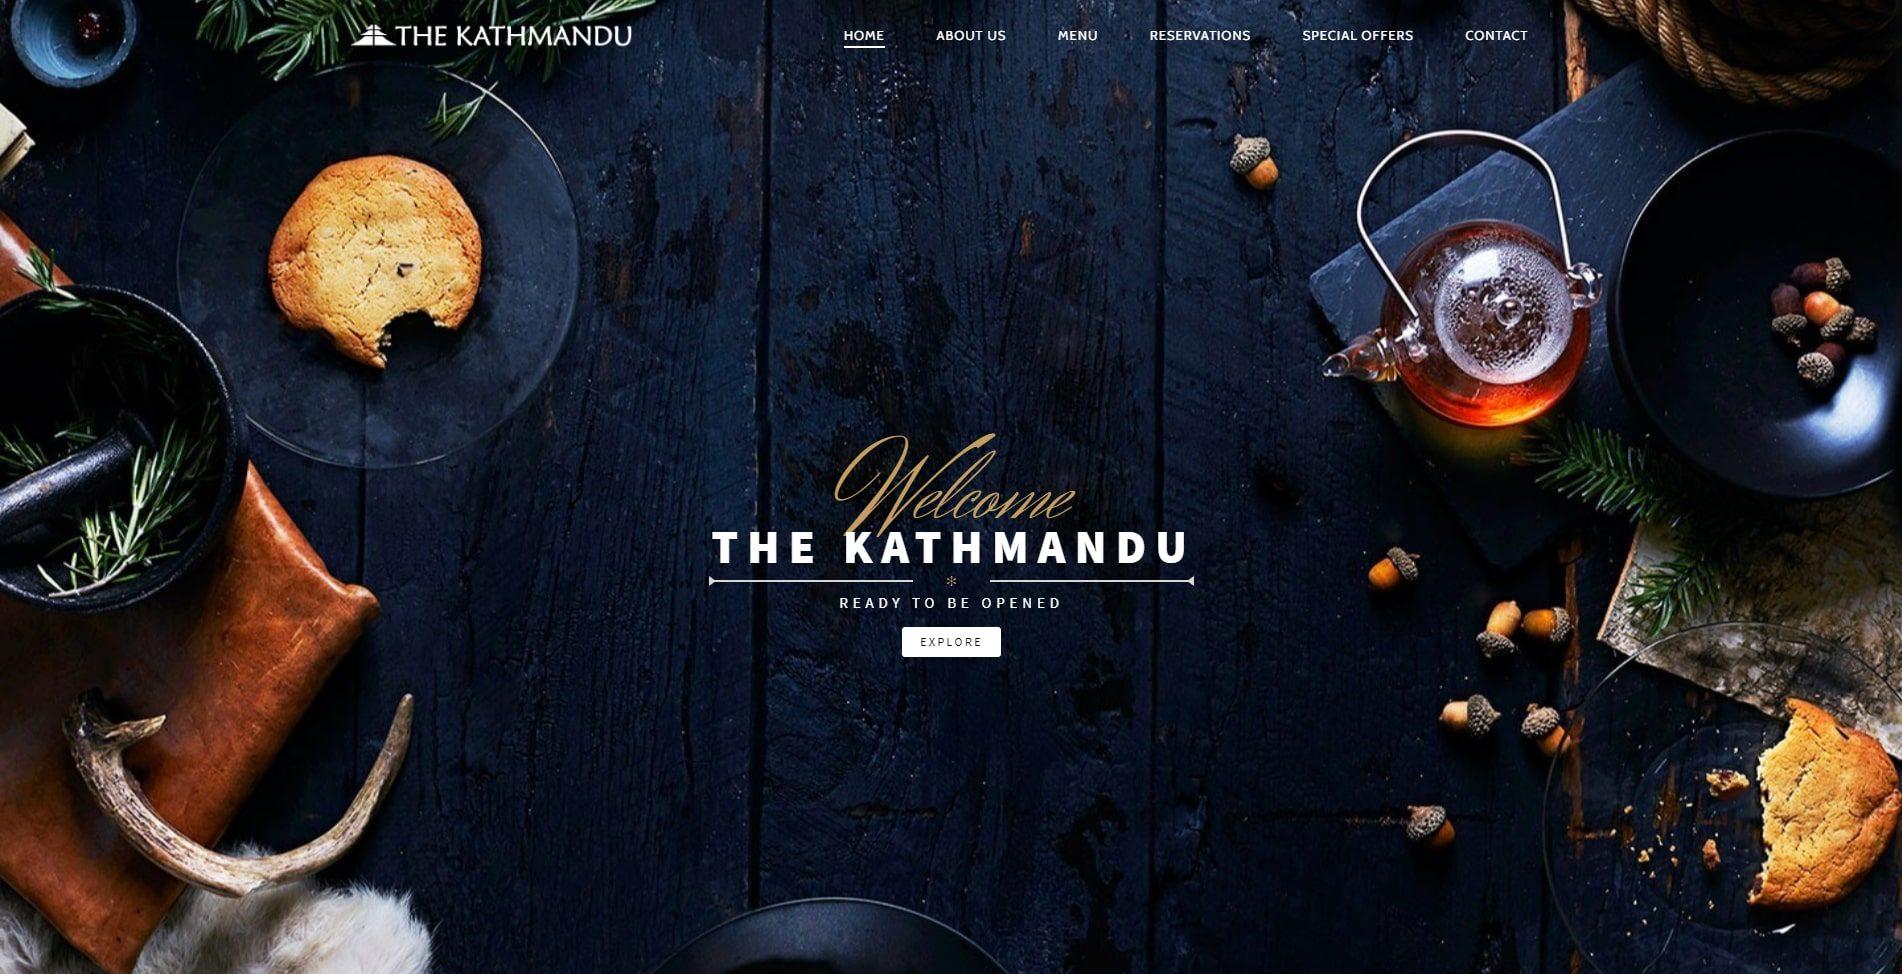 The Kathmandu - Spain